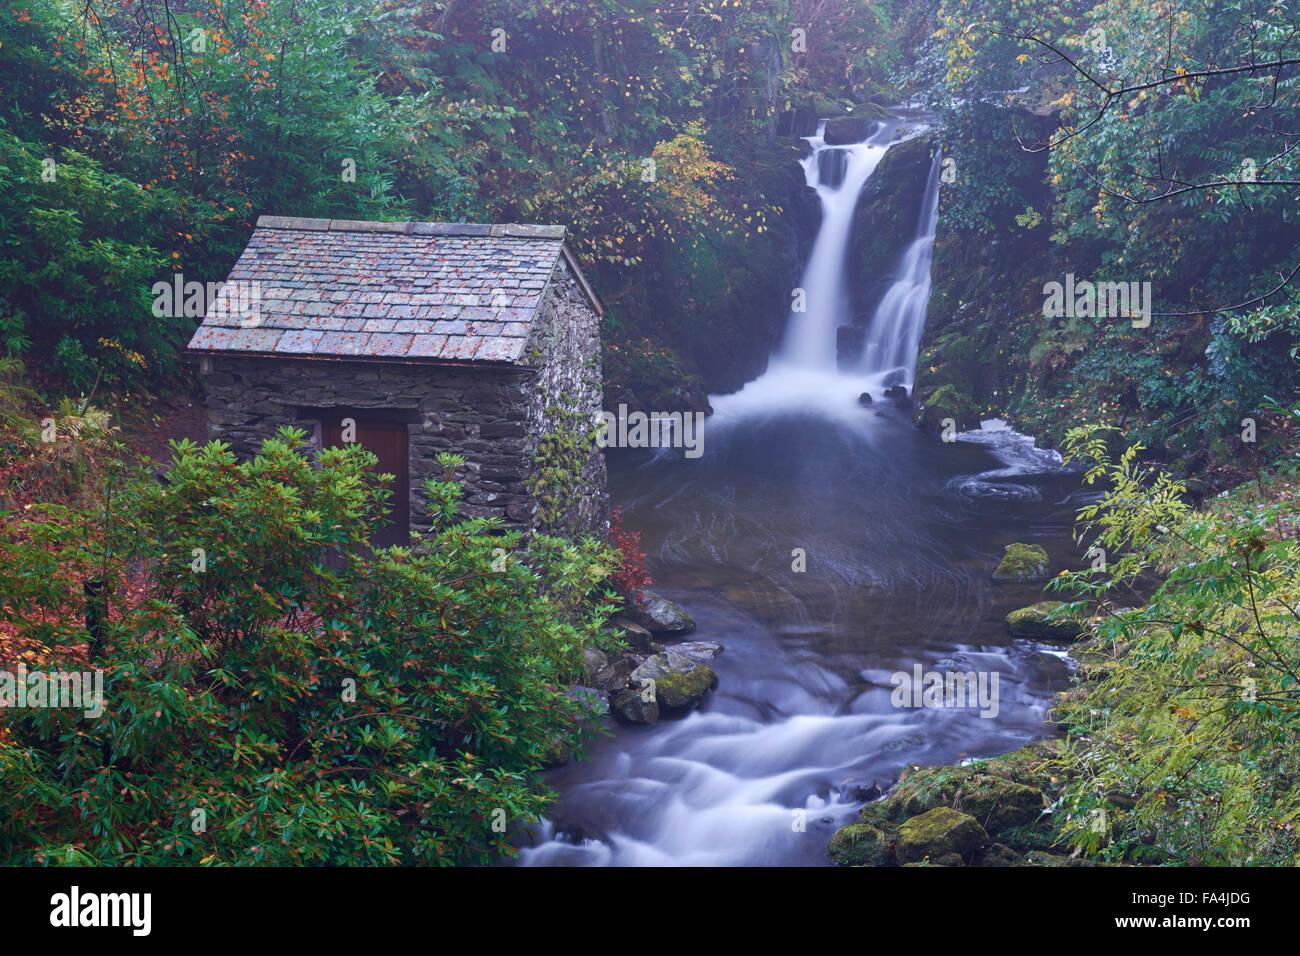 Rydal Hall Waterfalls - Lake District, England, UK - Stock Image